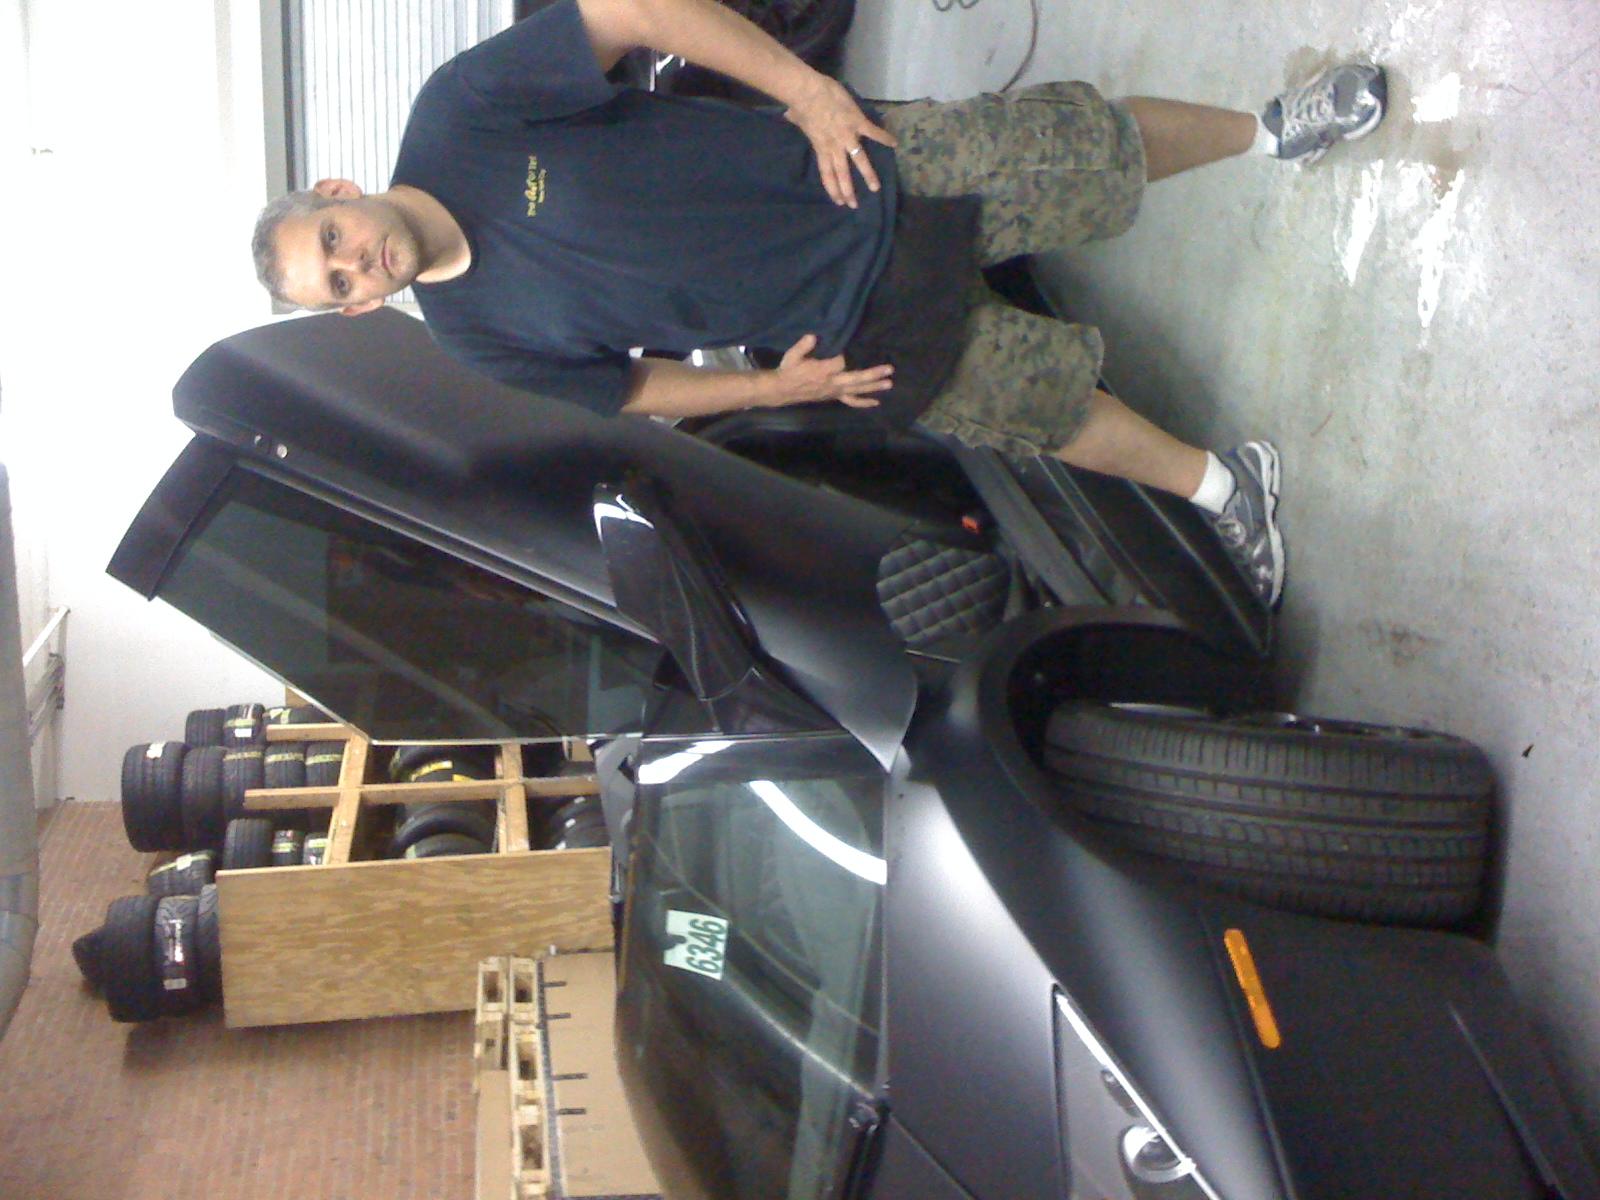 Matt Black Lamborghini Murcielago.  This one of a kind Lambo was incredible!